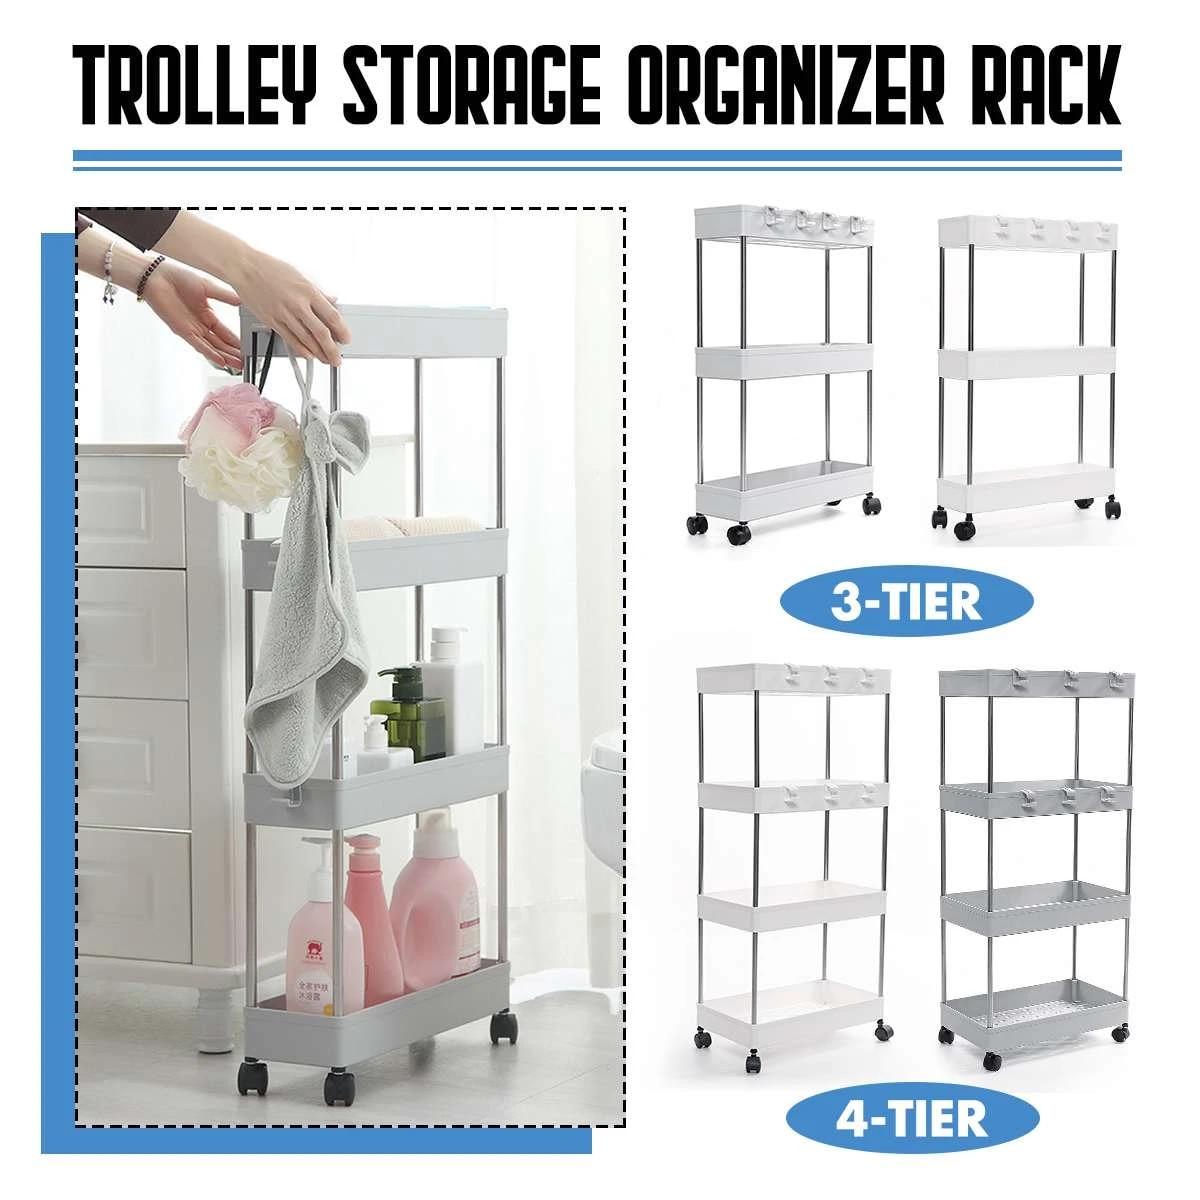 3 4 Tier Plastic Bathroom Slim Slide Out Trolley Storage Holder Shelf Rack Home Organizer With Wheel Hook Kitchen Accessories Storage Holders Racks Aliexpress